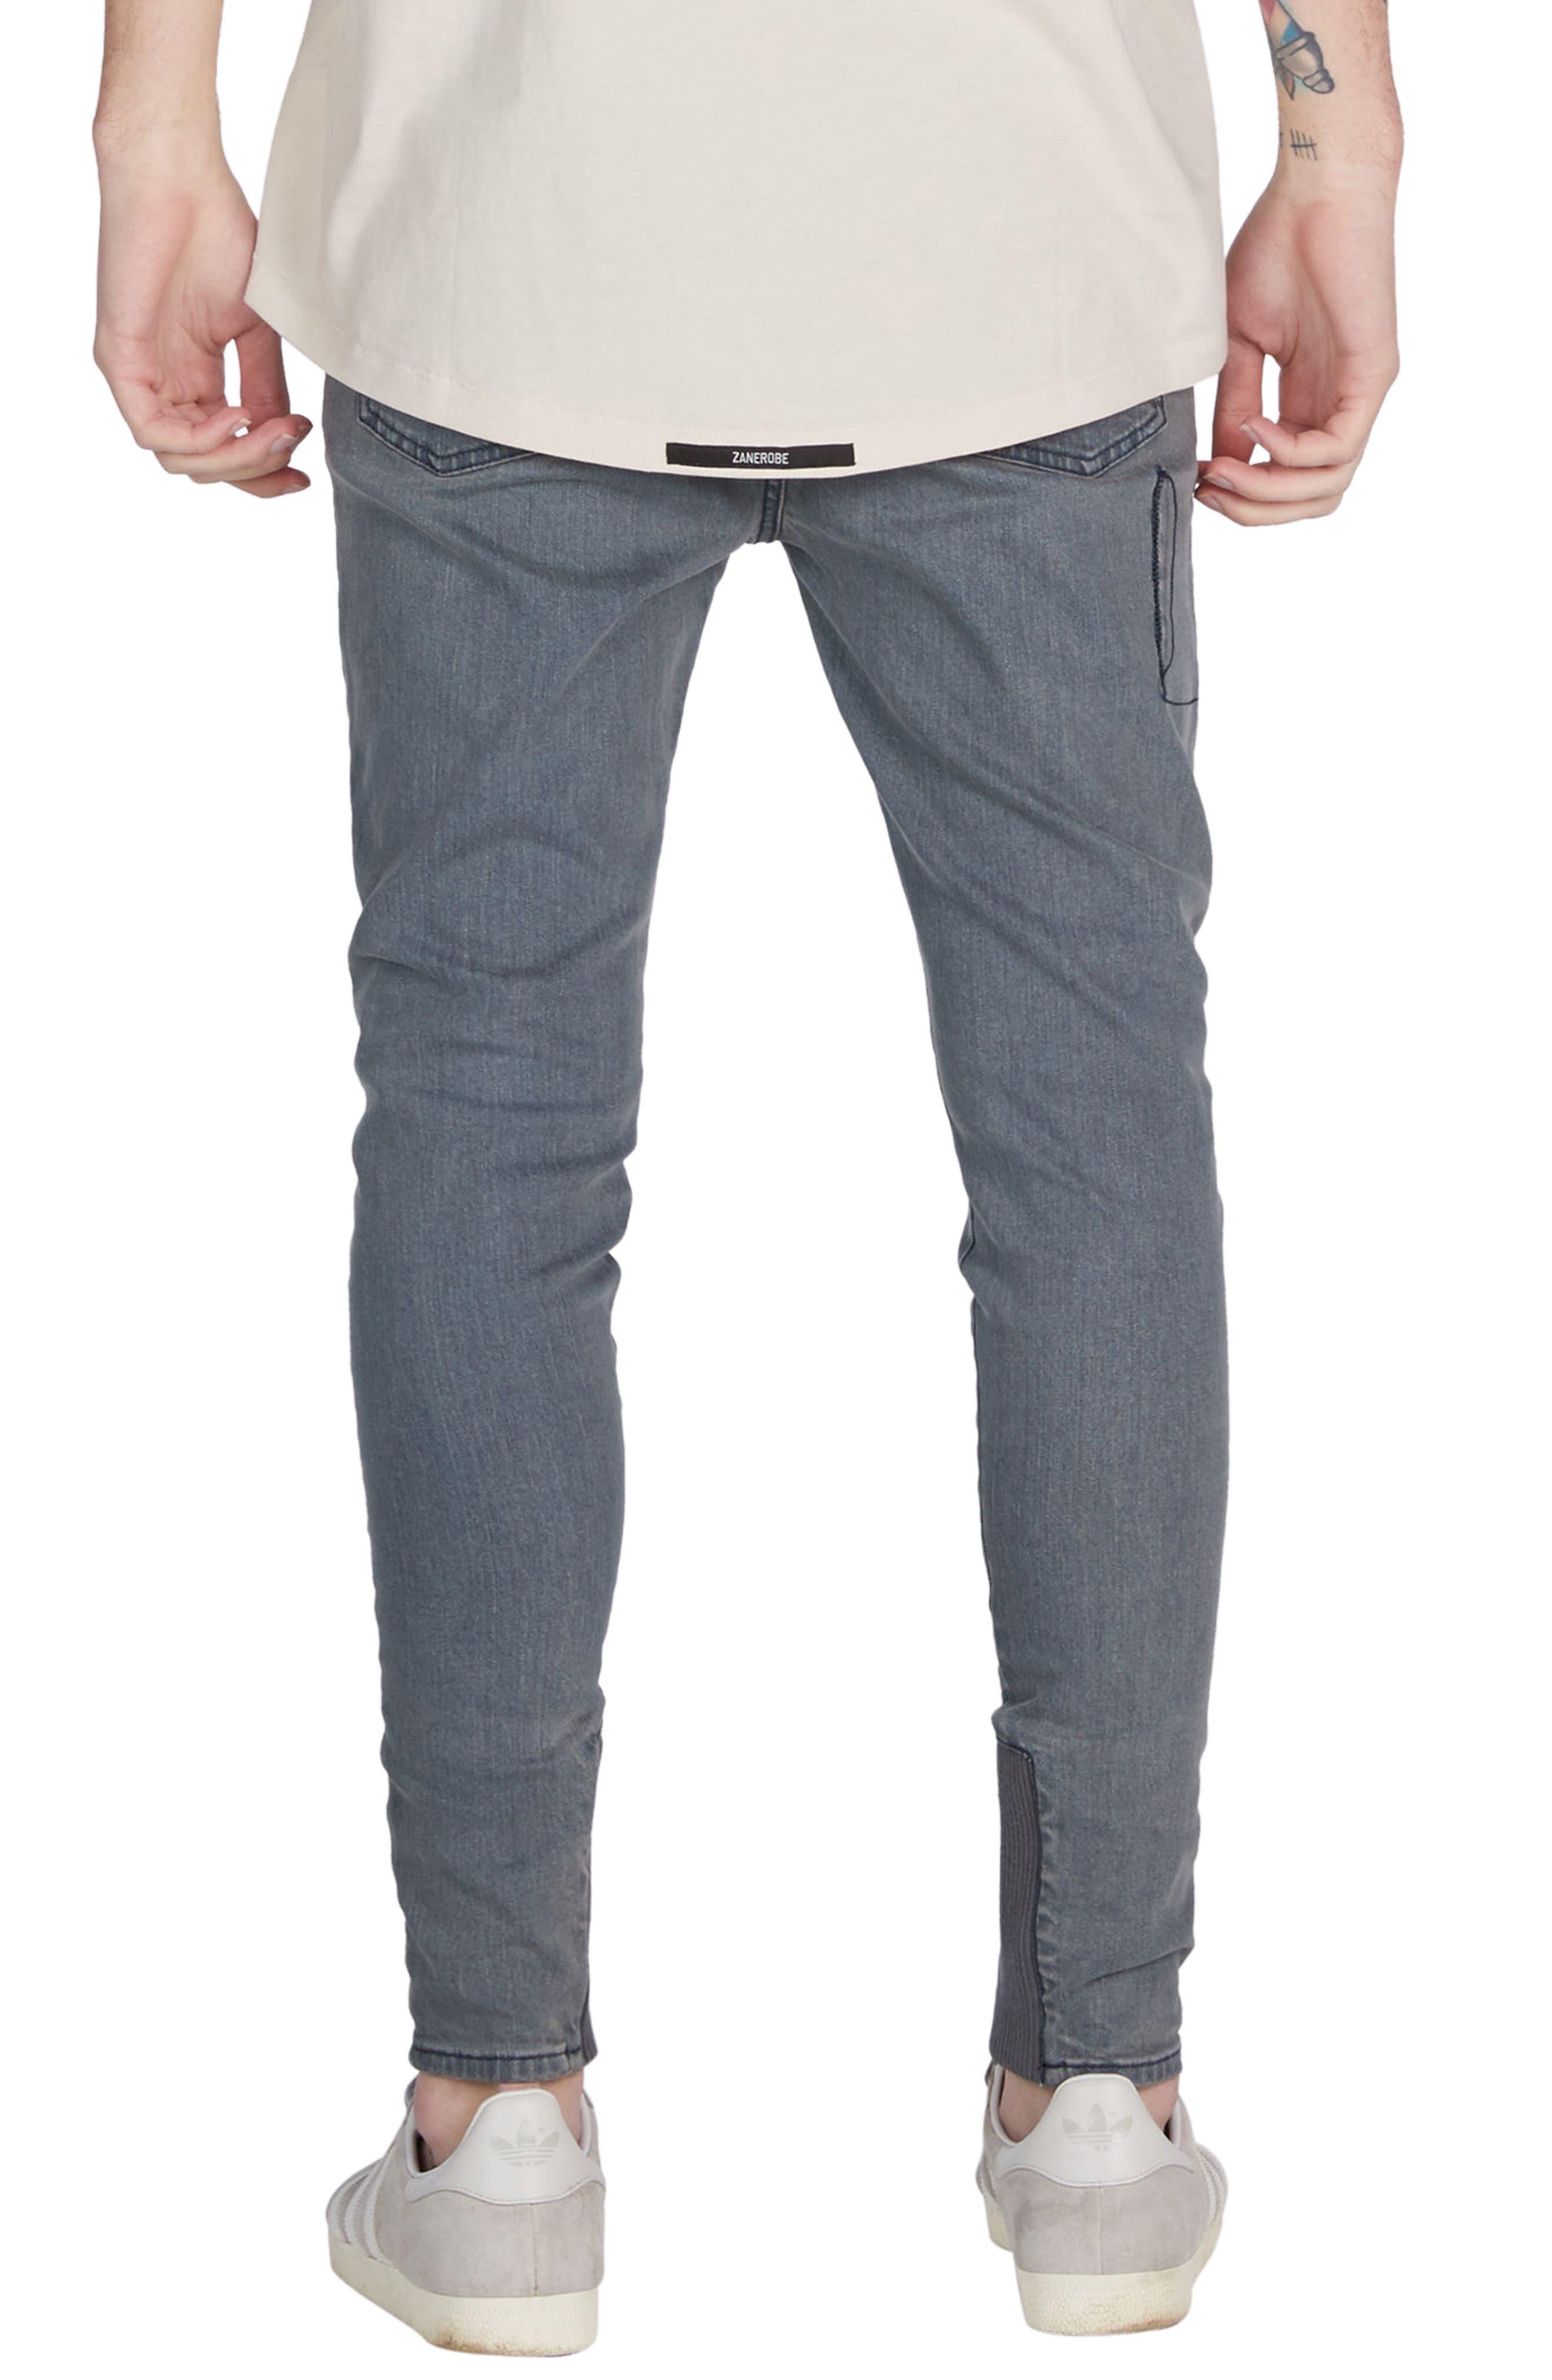 Sharpshot Slouchy Skinny Fit Denim Pants,                             Alternate thumbnail 2, color,                             Blue Grey